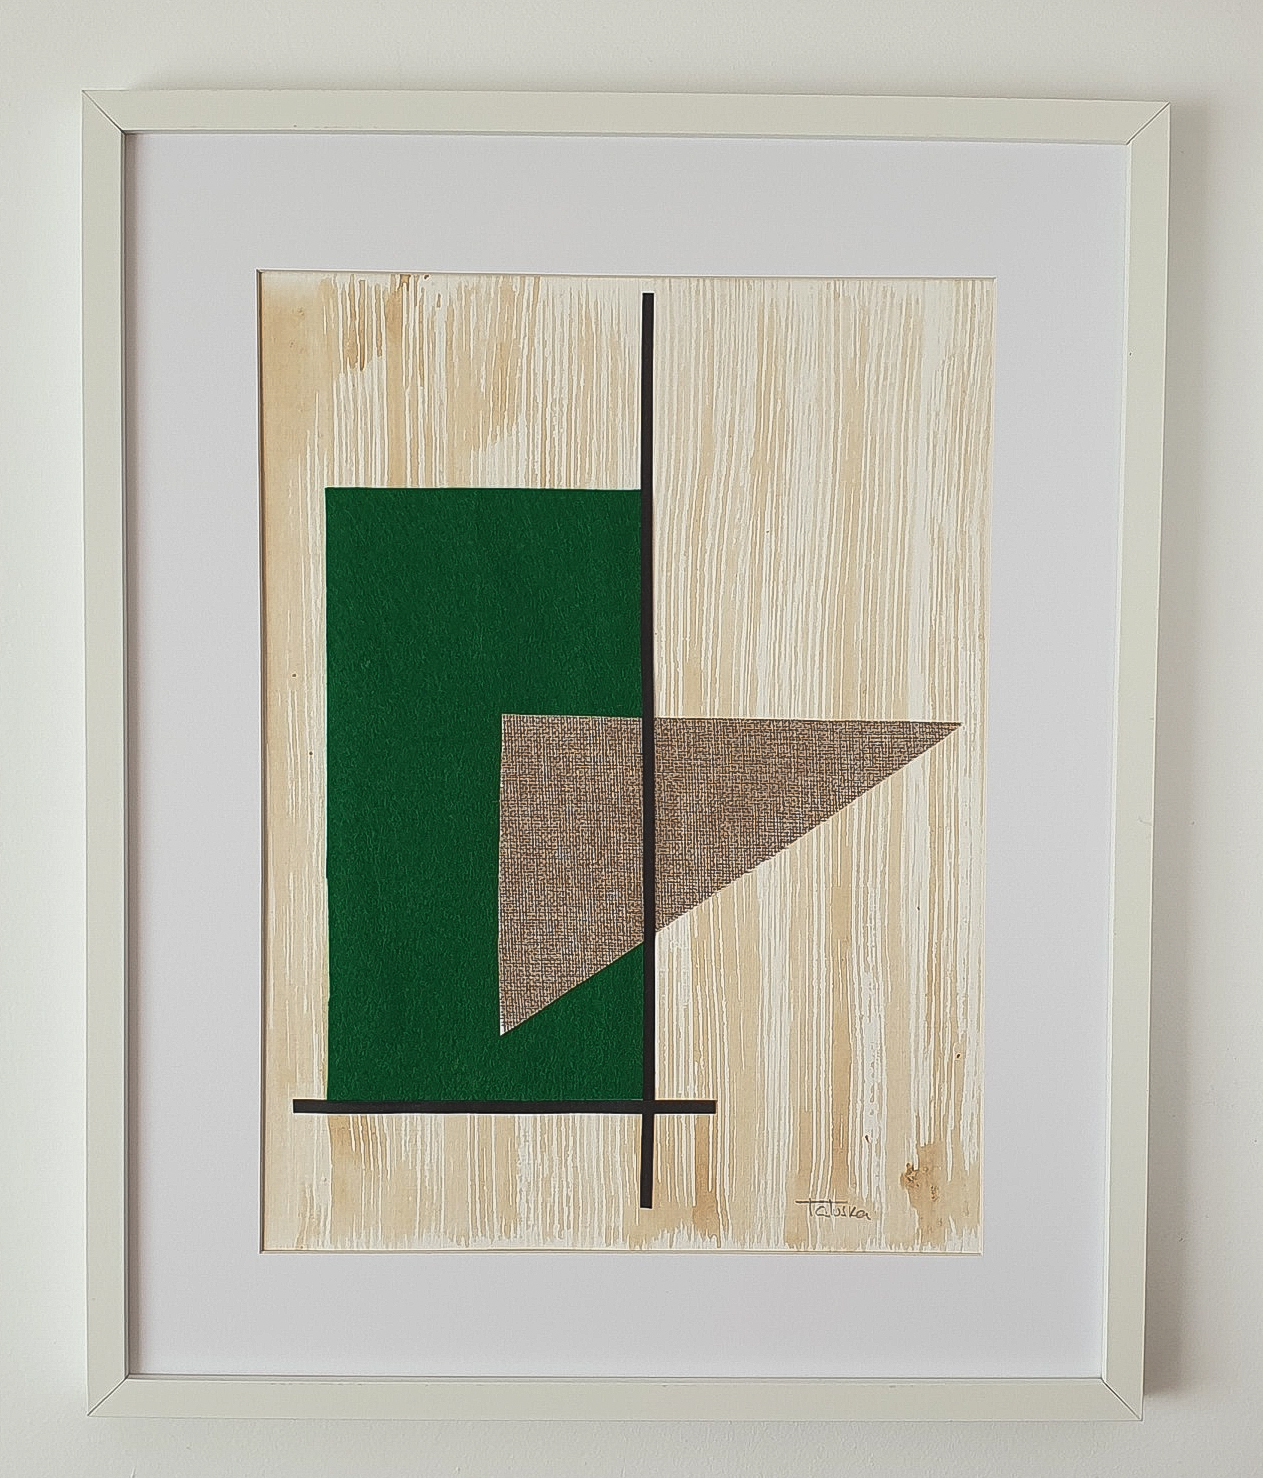 "Cuadro de arte abstracto titulado ""Geometry"" de la artista Tatuska (https://artuska.com)"